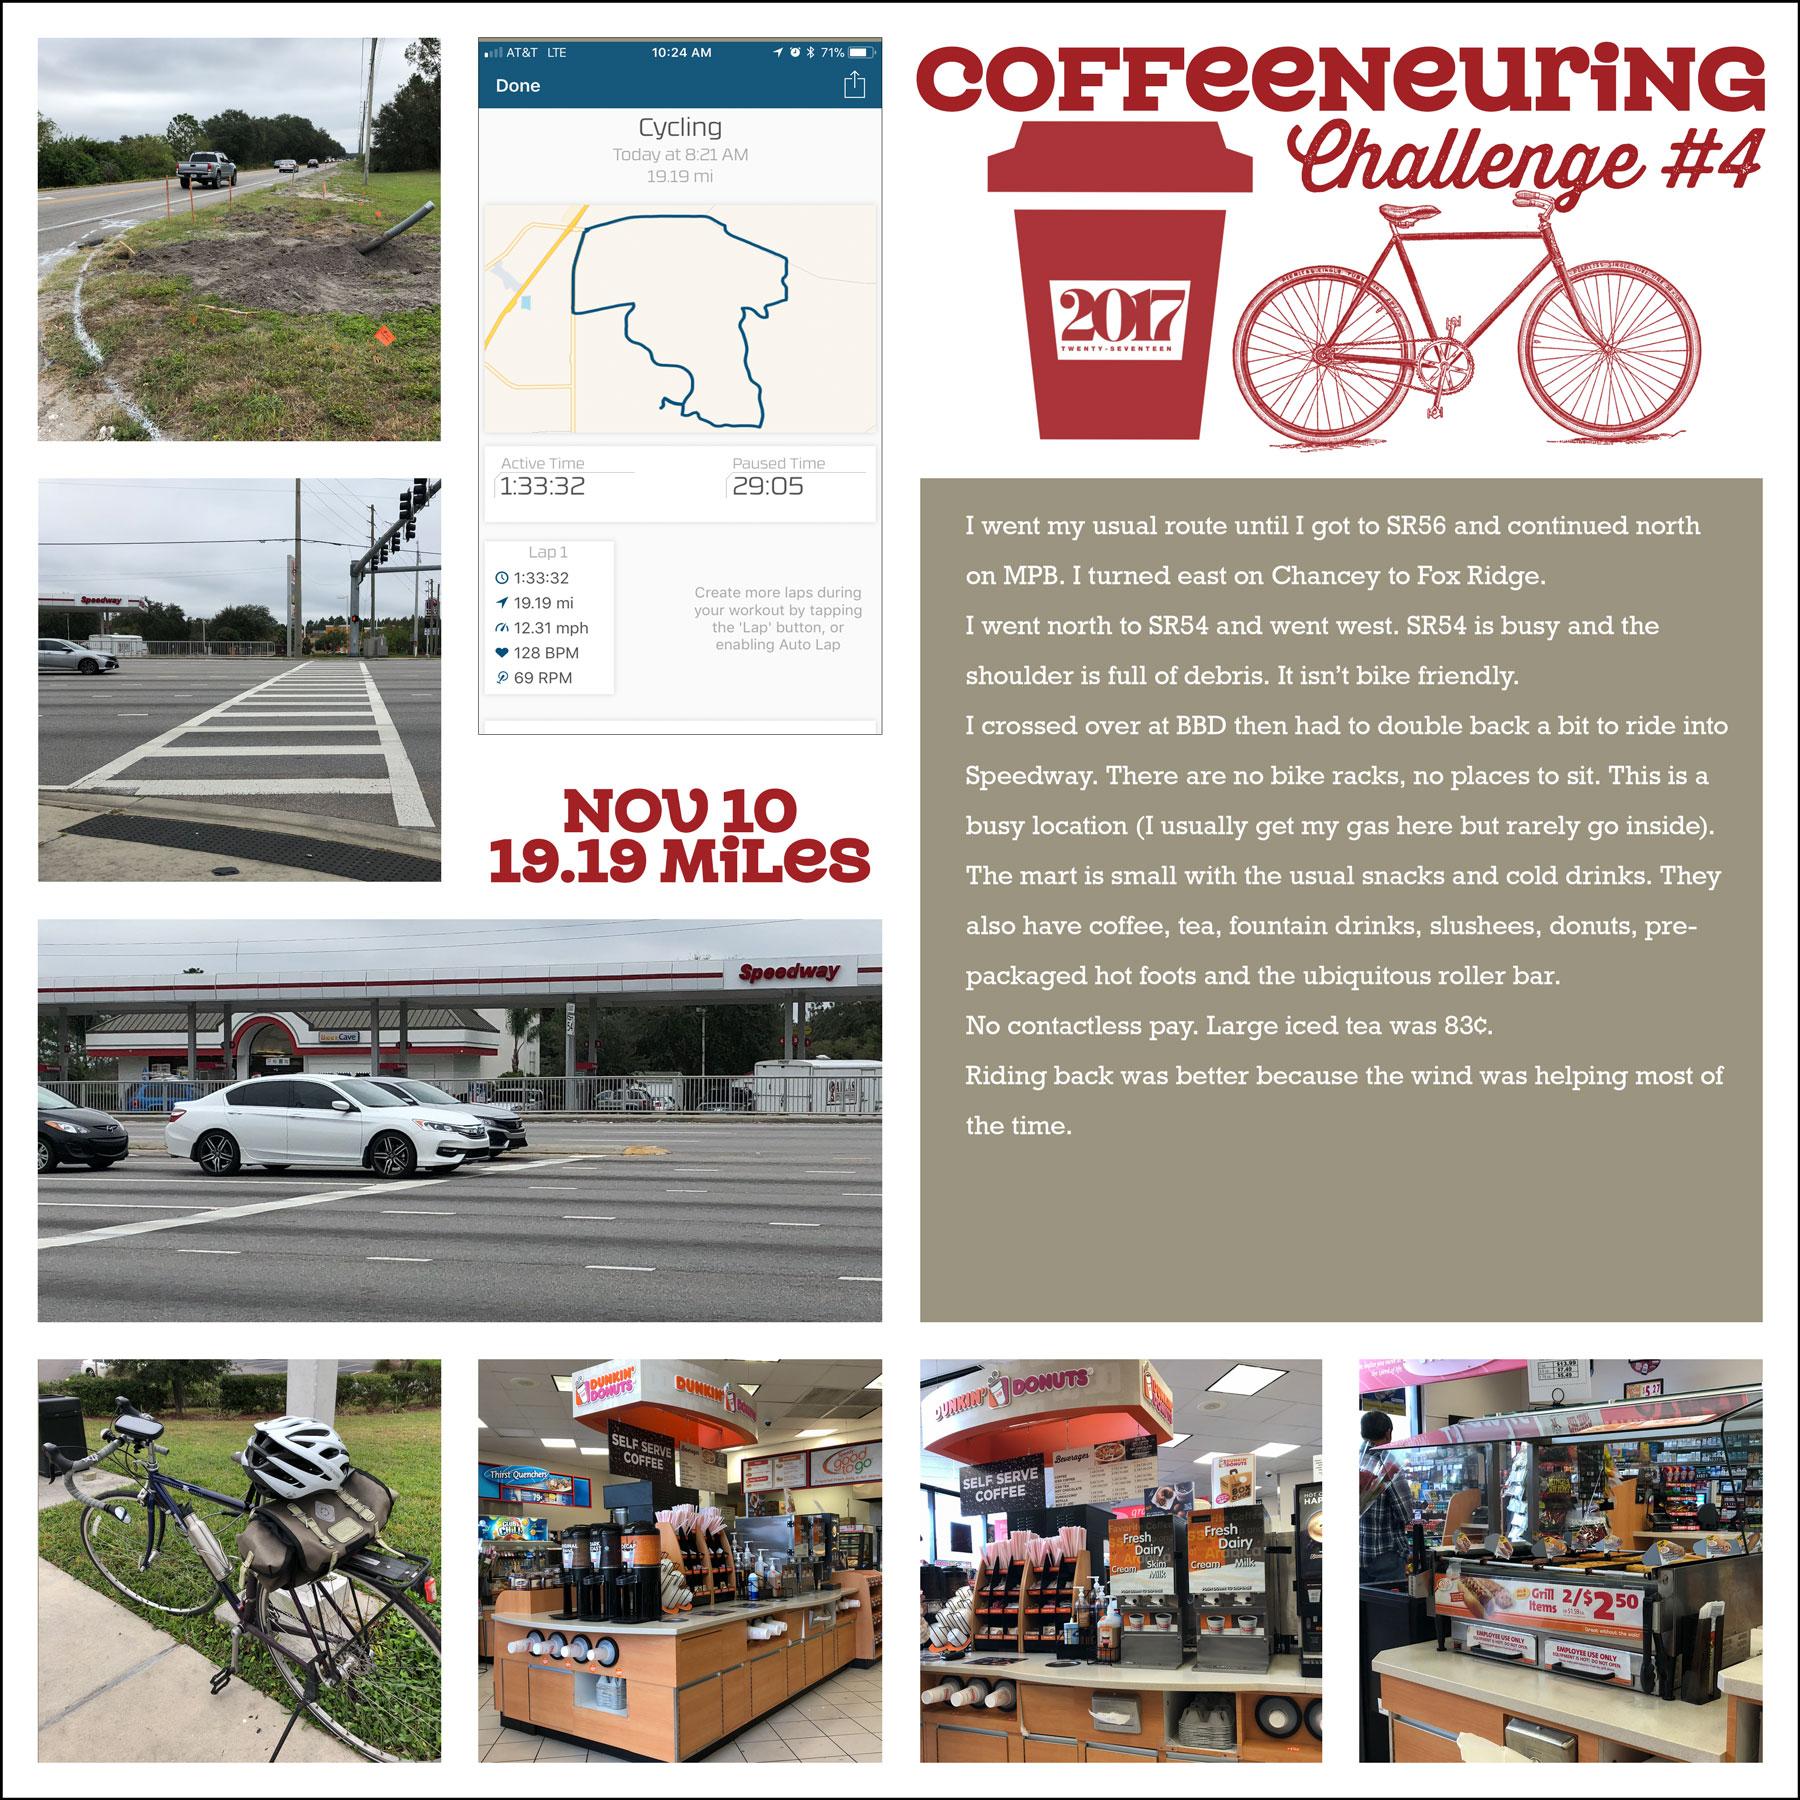 20171110-coffeeneuring.jpg